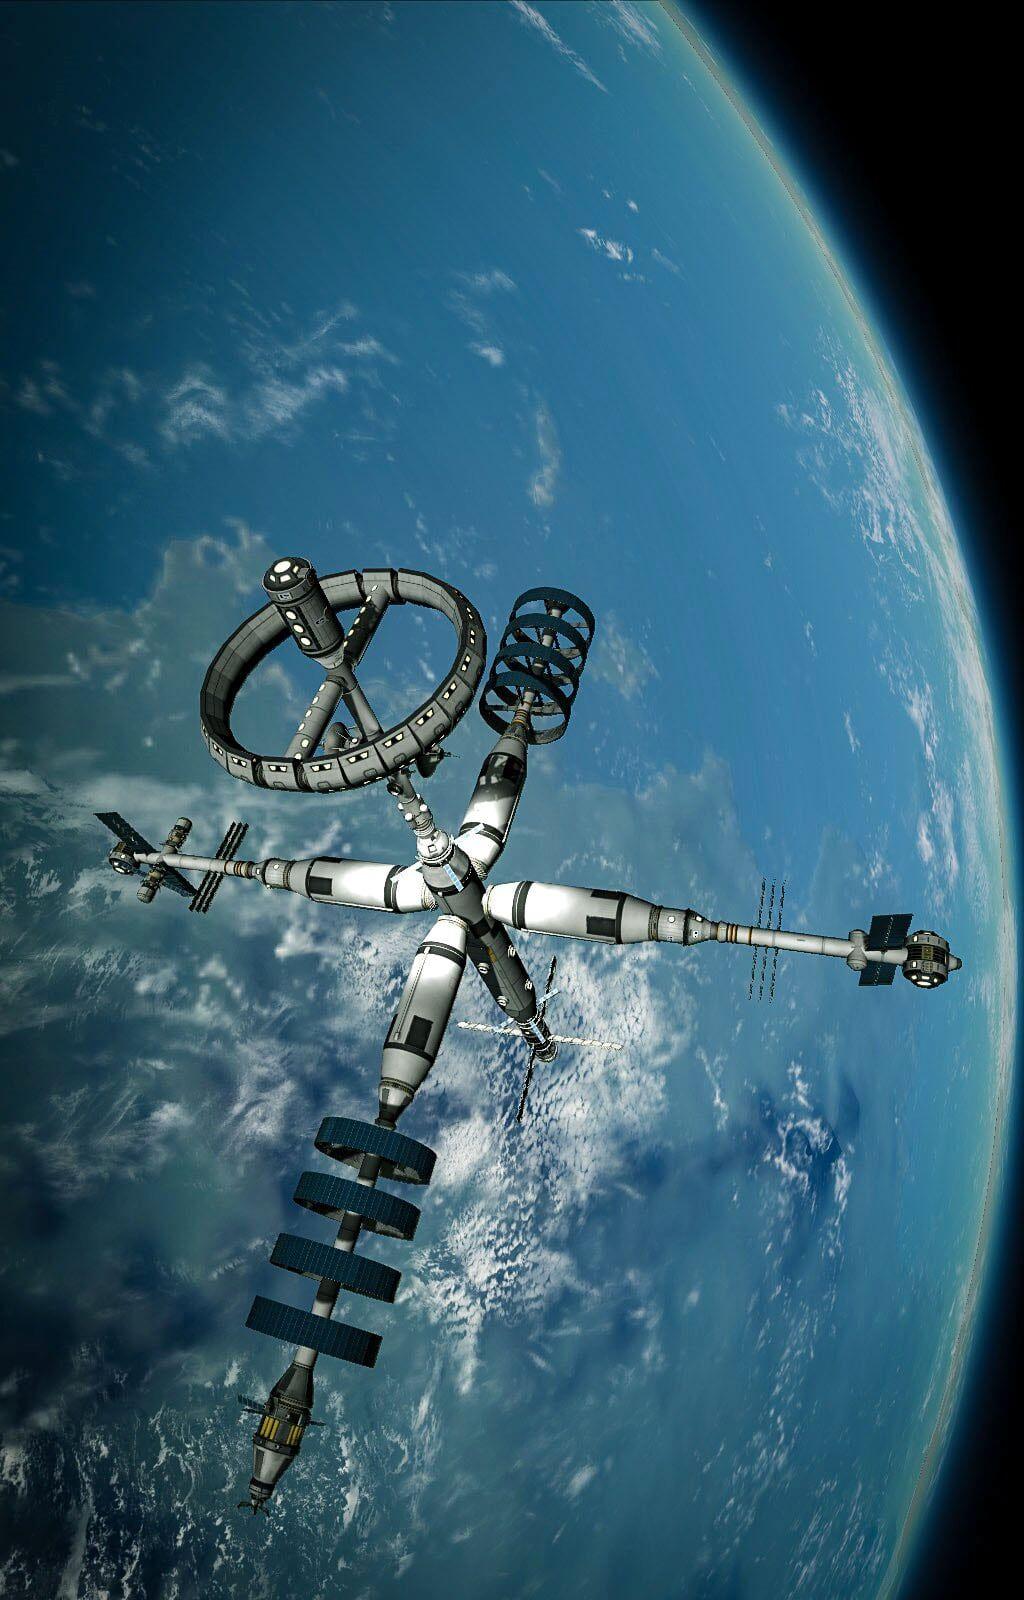 y4mrqiGnnSSkt_82H9hM62wJxMZOycqlE5vr0qEz | Space station ...